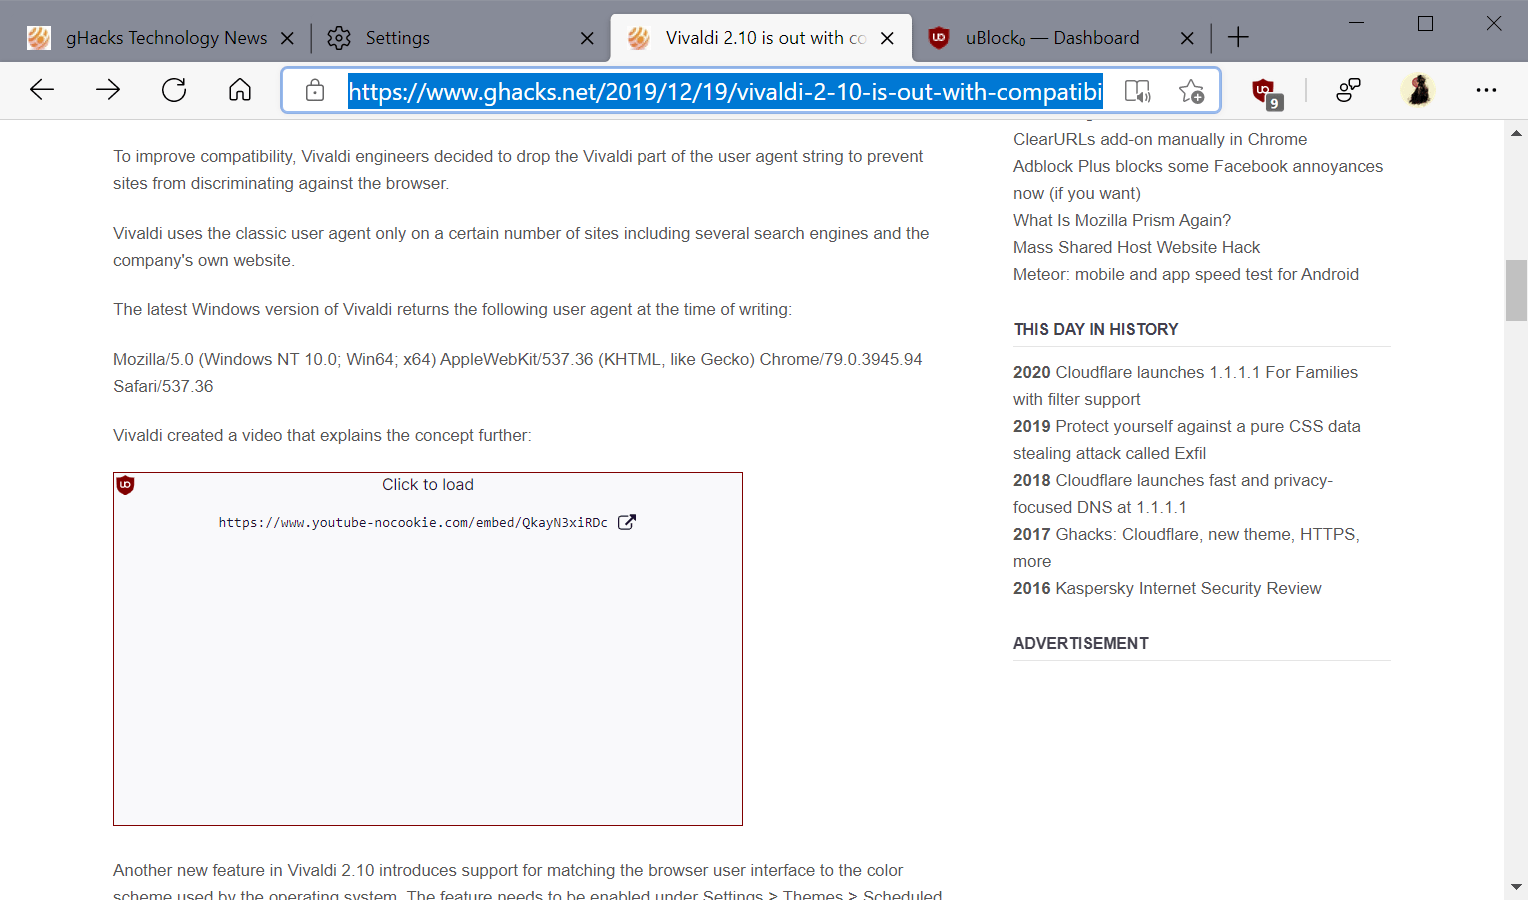 ublock origin haga clic para cargar